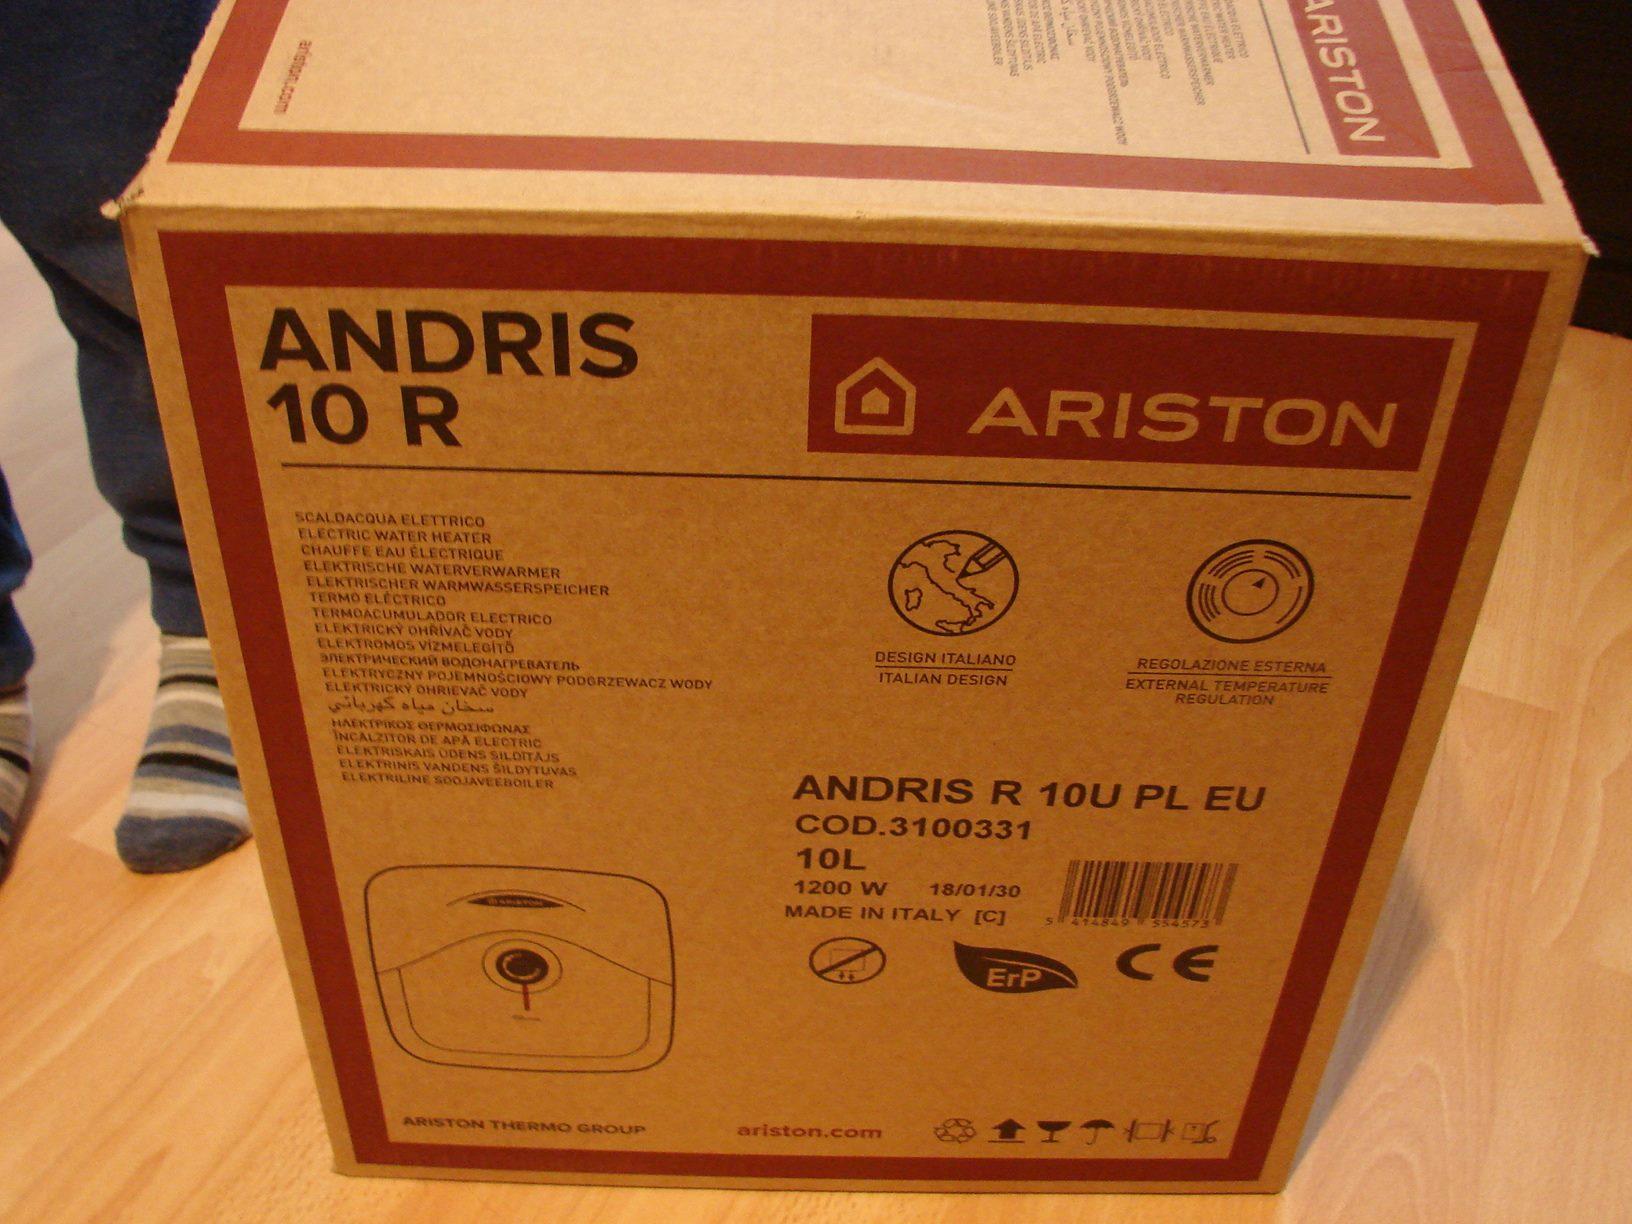 Podgrzewacz Wody Podumywalkowy 10l Ariston Andris 7432632587 R 10 L 200 Watt Electric Watet Heater